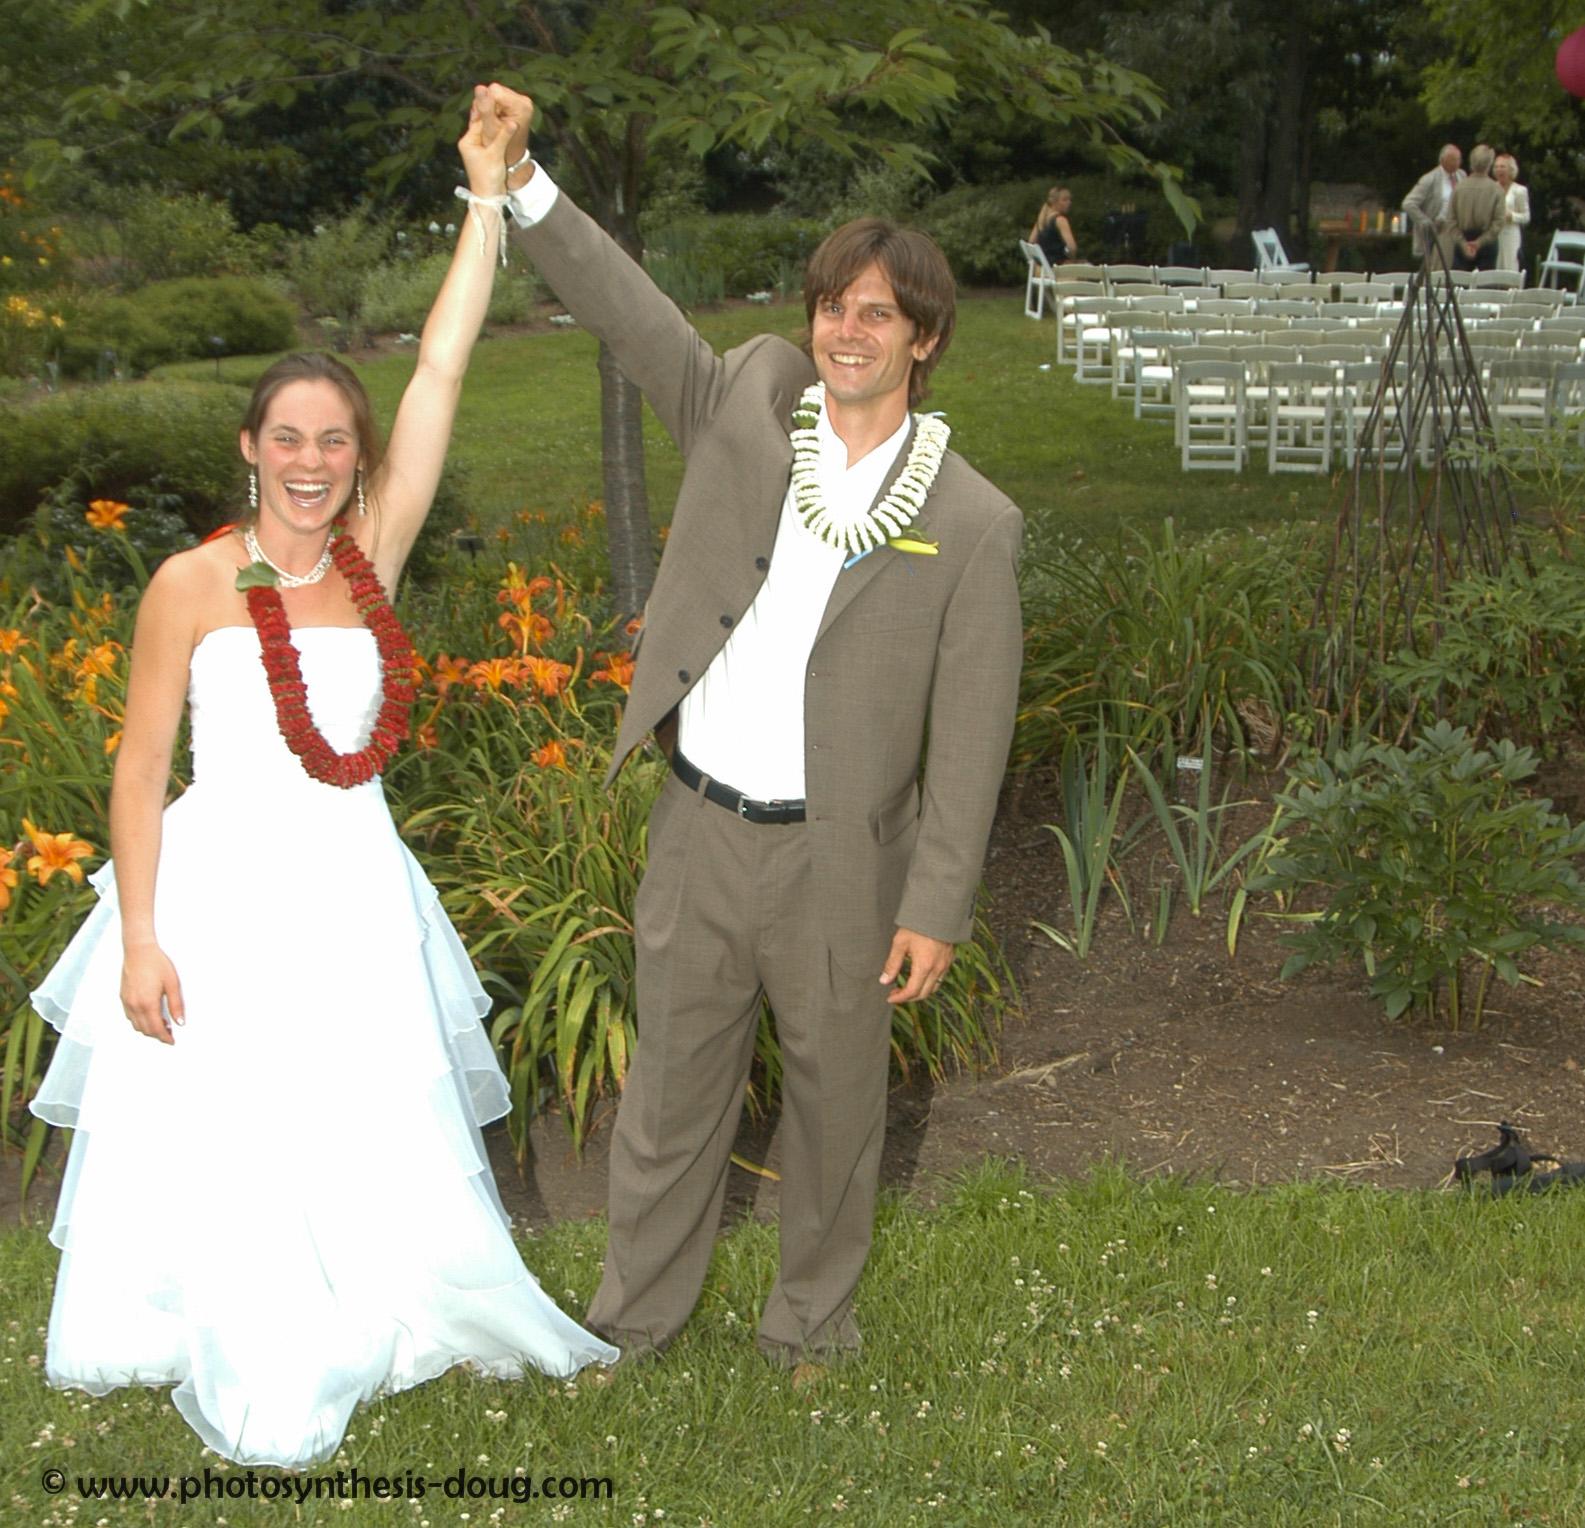 wedding work-3474.JPG